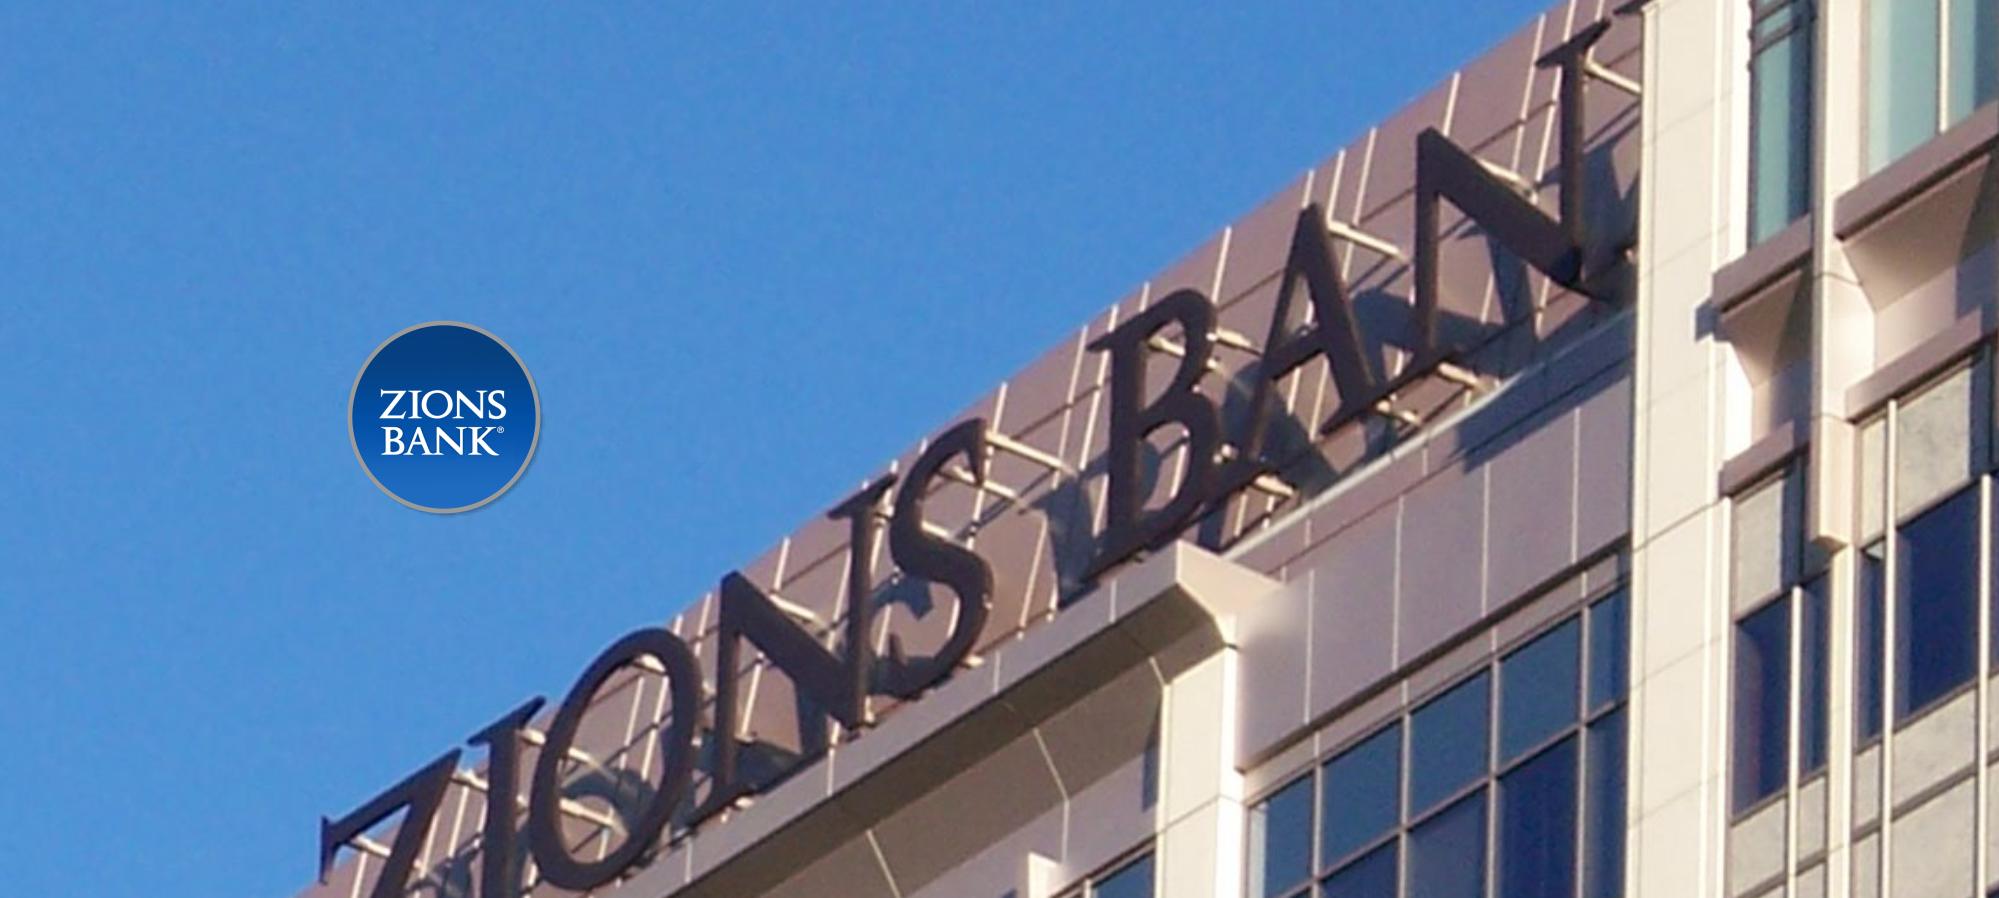 Zions Bancorporation